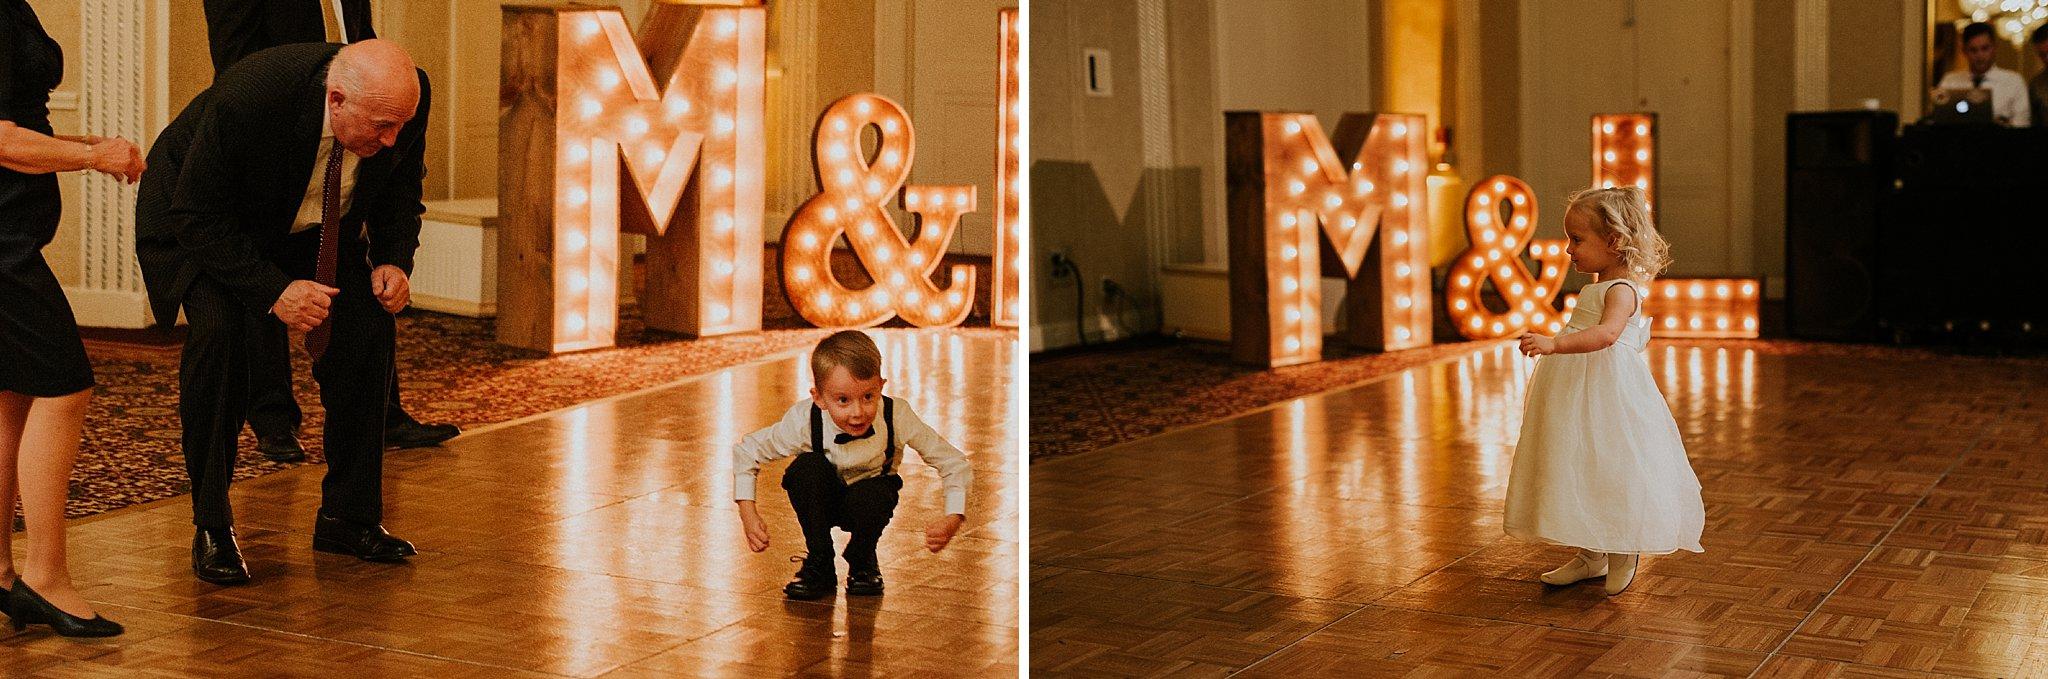 Matt-Lauren_St-Marys_Hilton-City-Center-Milwaukee-Wedding_liller-photo_0077.jpg